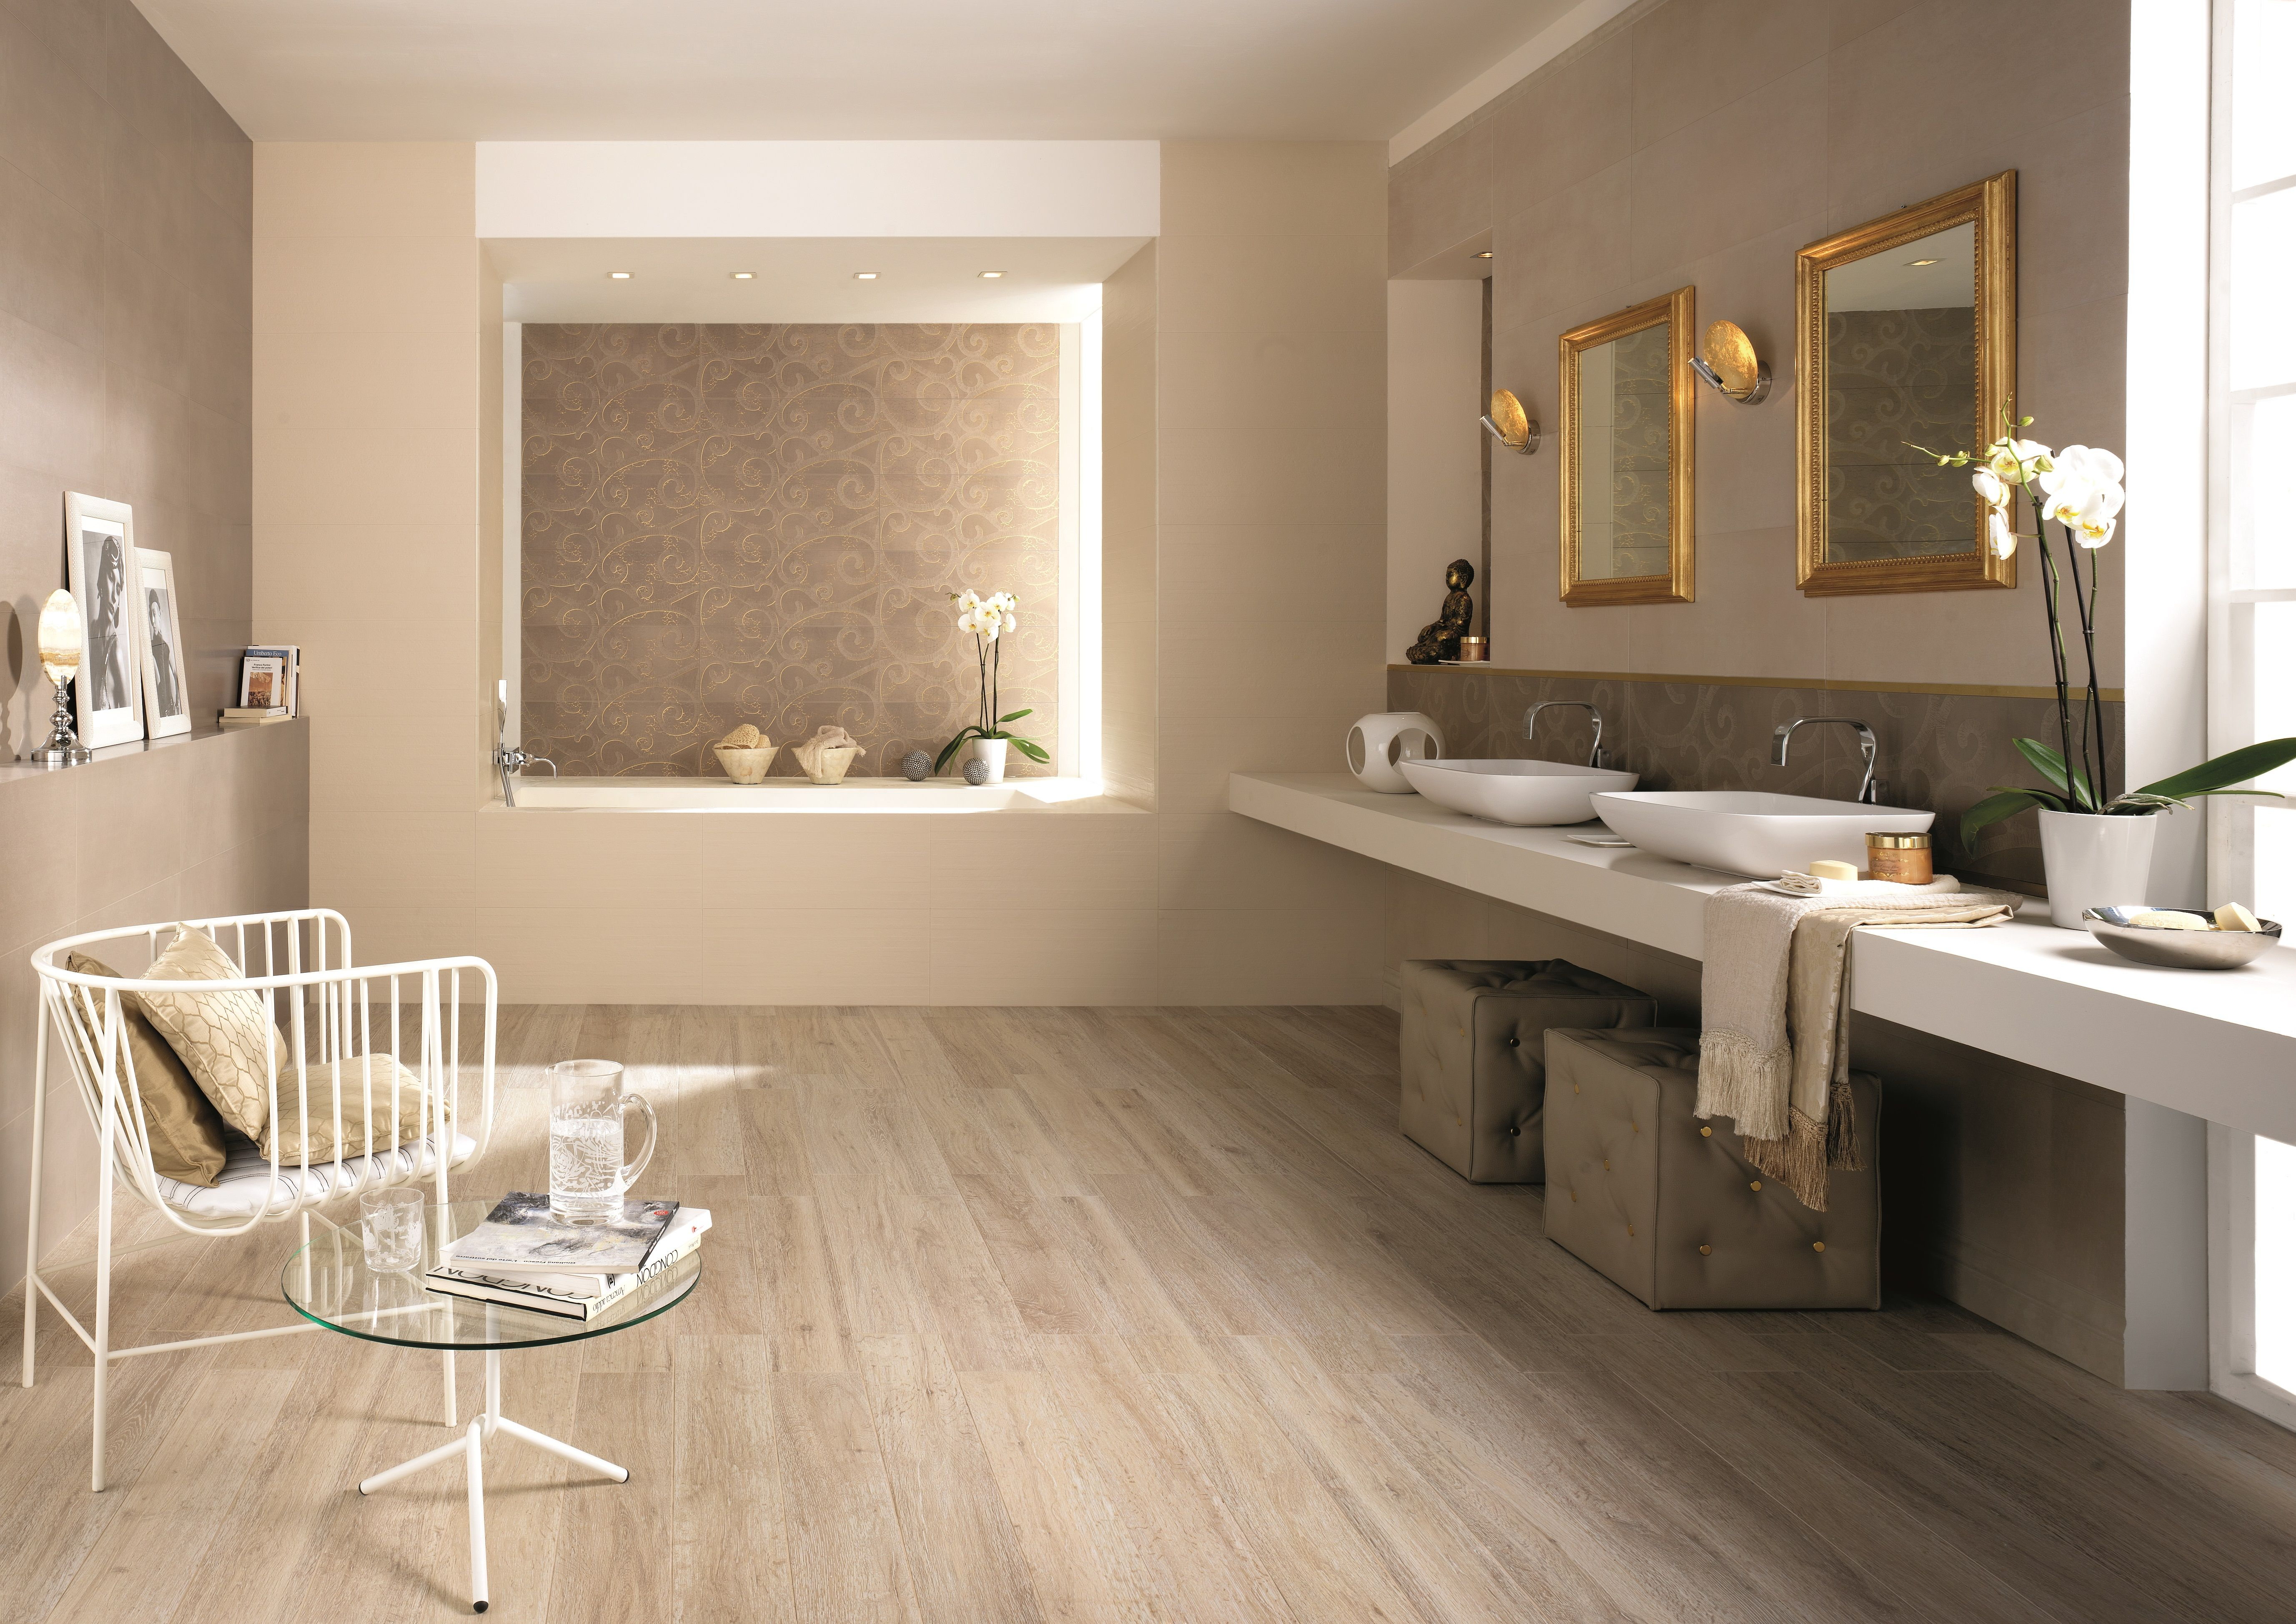 Fliesen holzoptik hersteller inspiration fliesen for Hersteller badezimmer